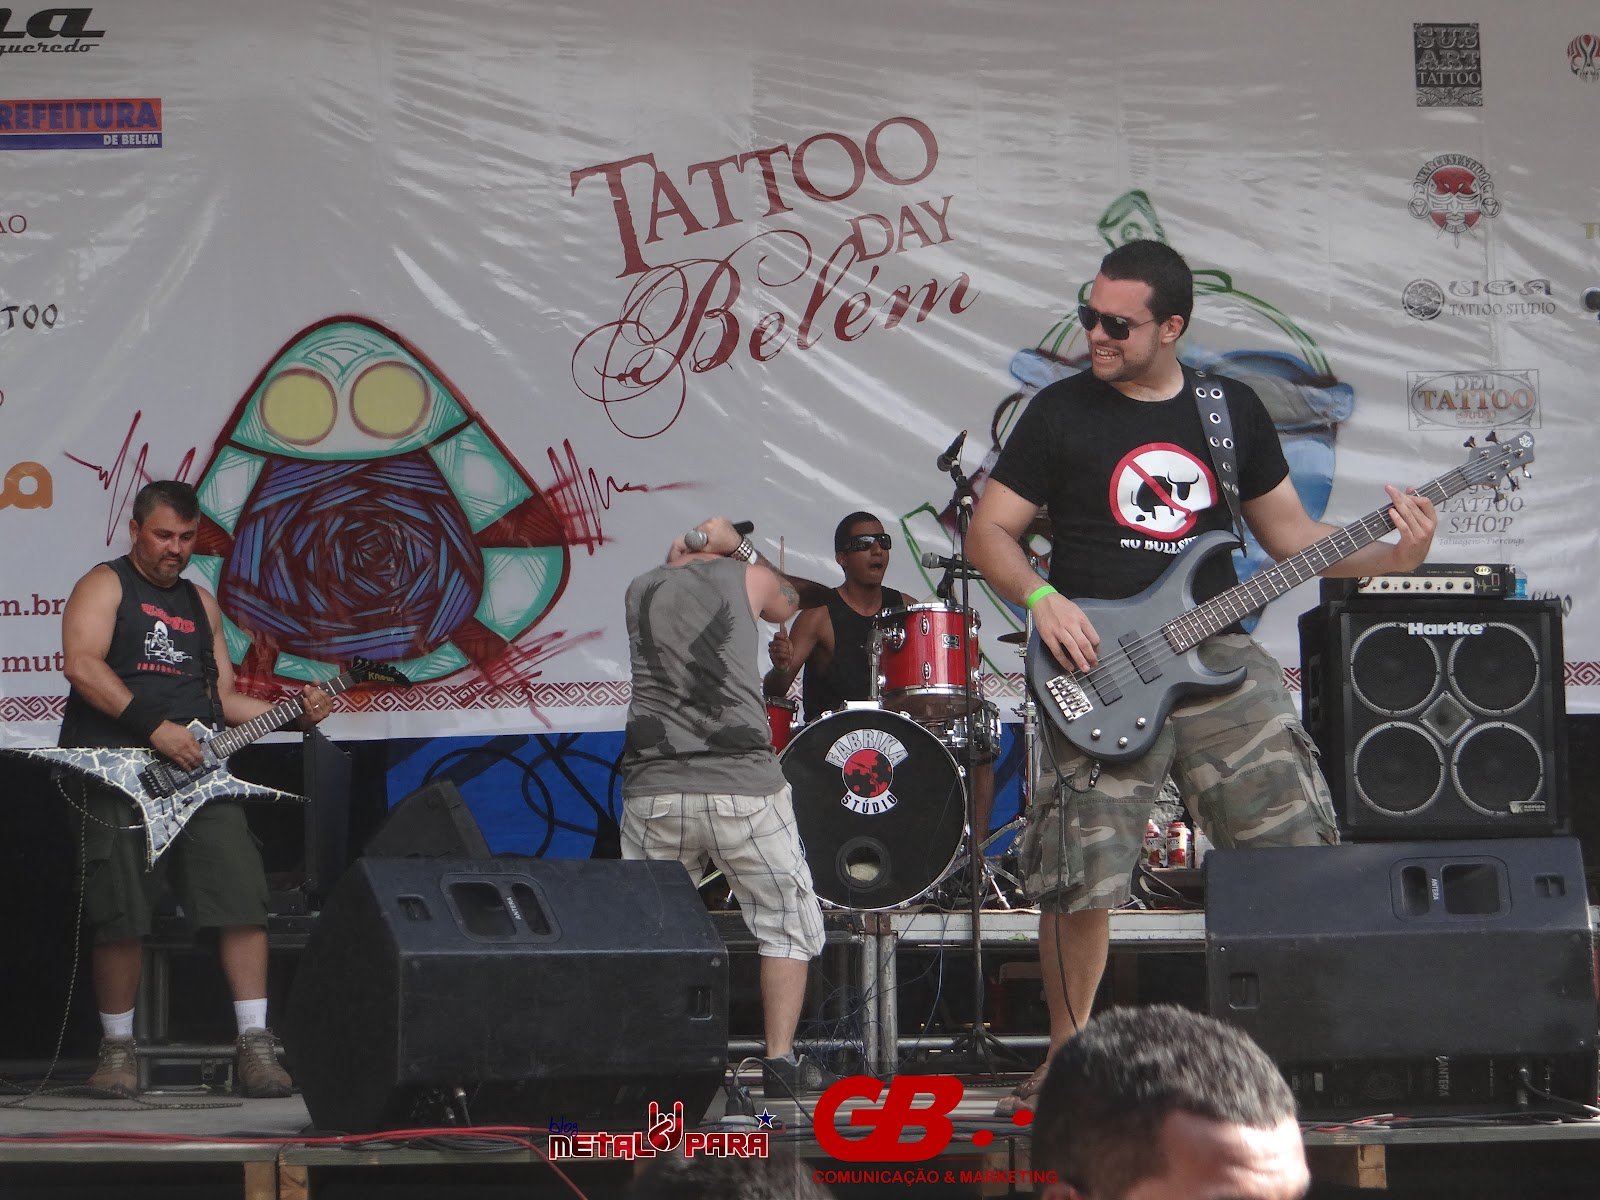 http://2.bp.blogspot.com/-cyoQQrvA7_g/UAH7zd7FoNI/AAAAAAAABD8/d9DBrMsYRz0/s1600/Tattoo%20Day%20Belém%20-%2008-07-2012%2000088.jpg